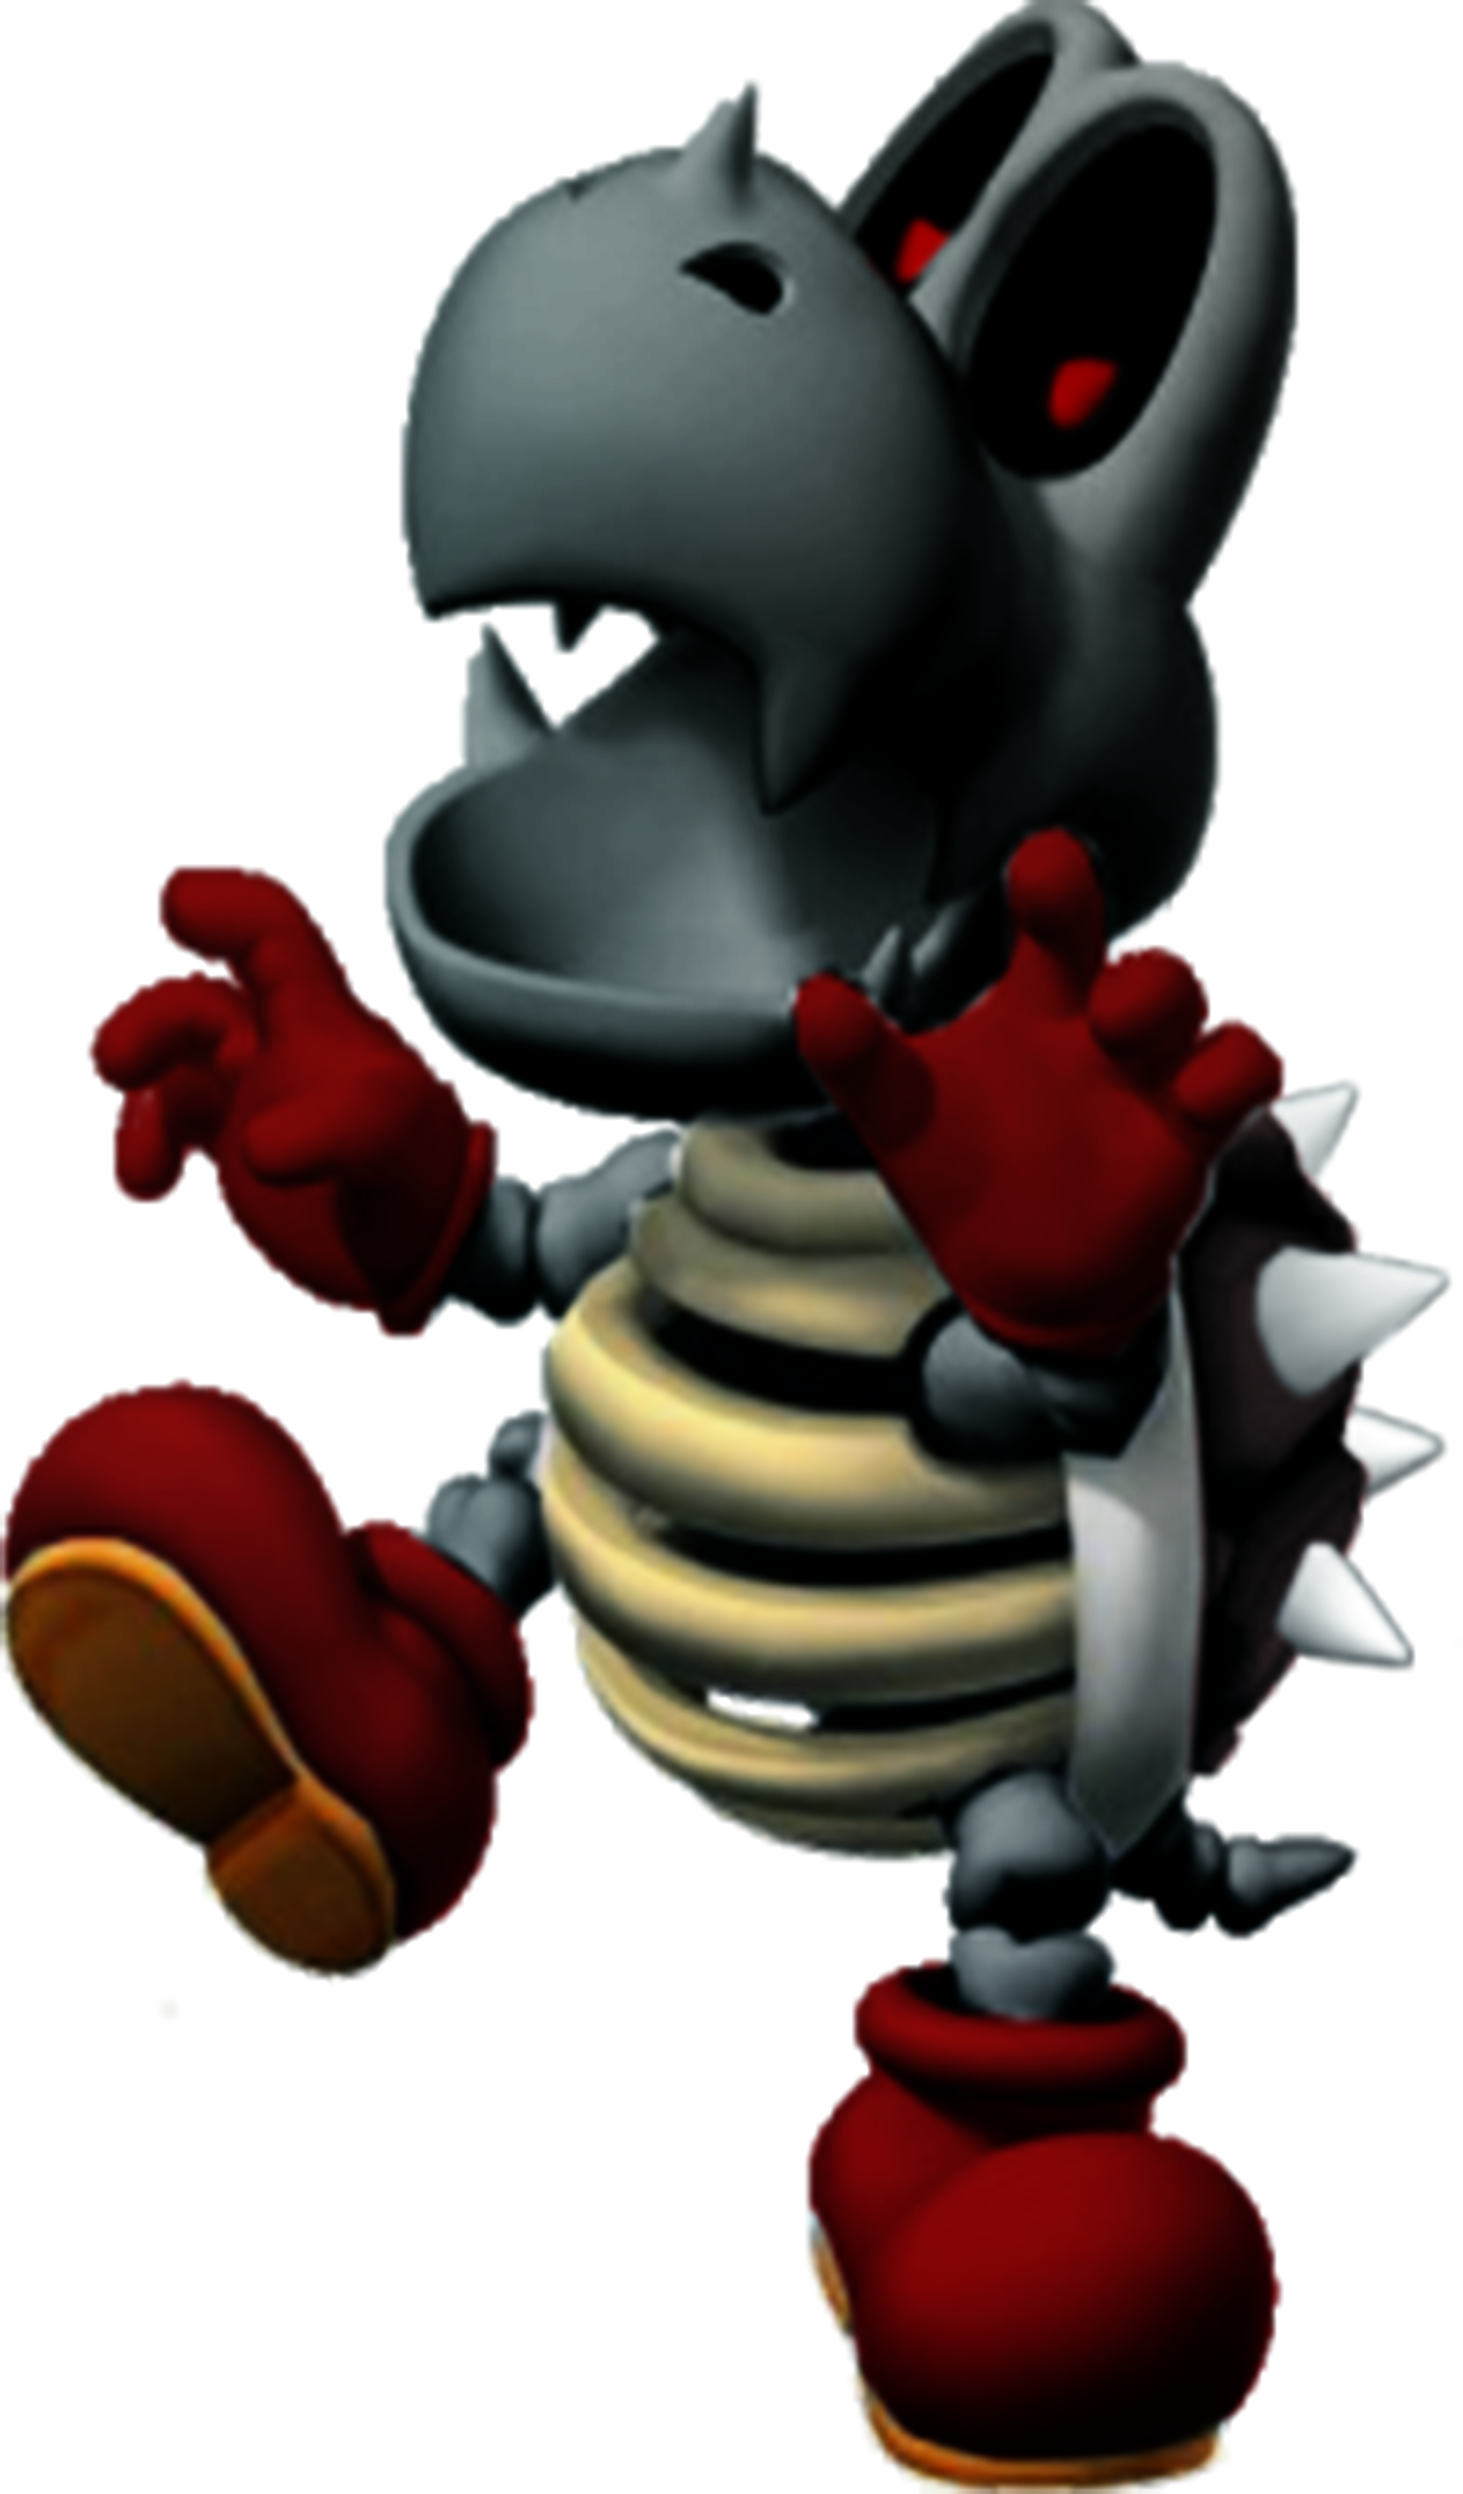 Bones goanimate v wiki. Clipart walking dark figure